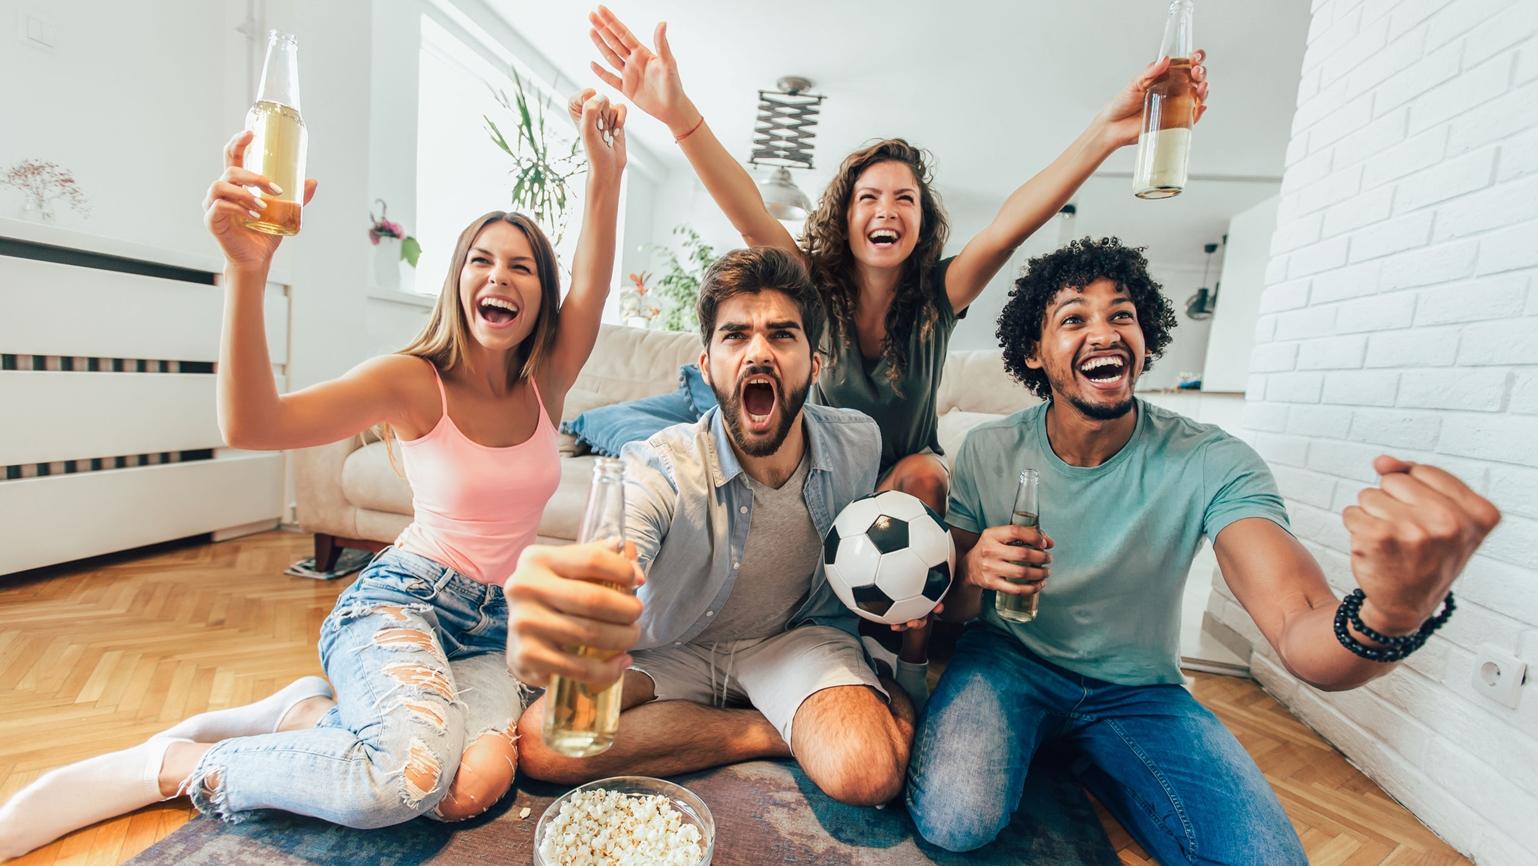 Football fans watching football at home